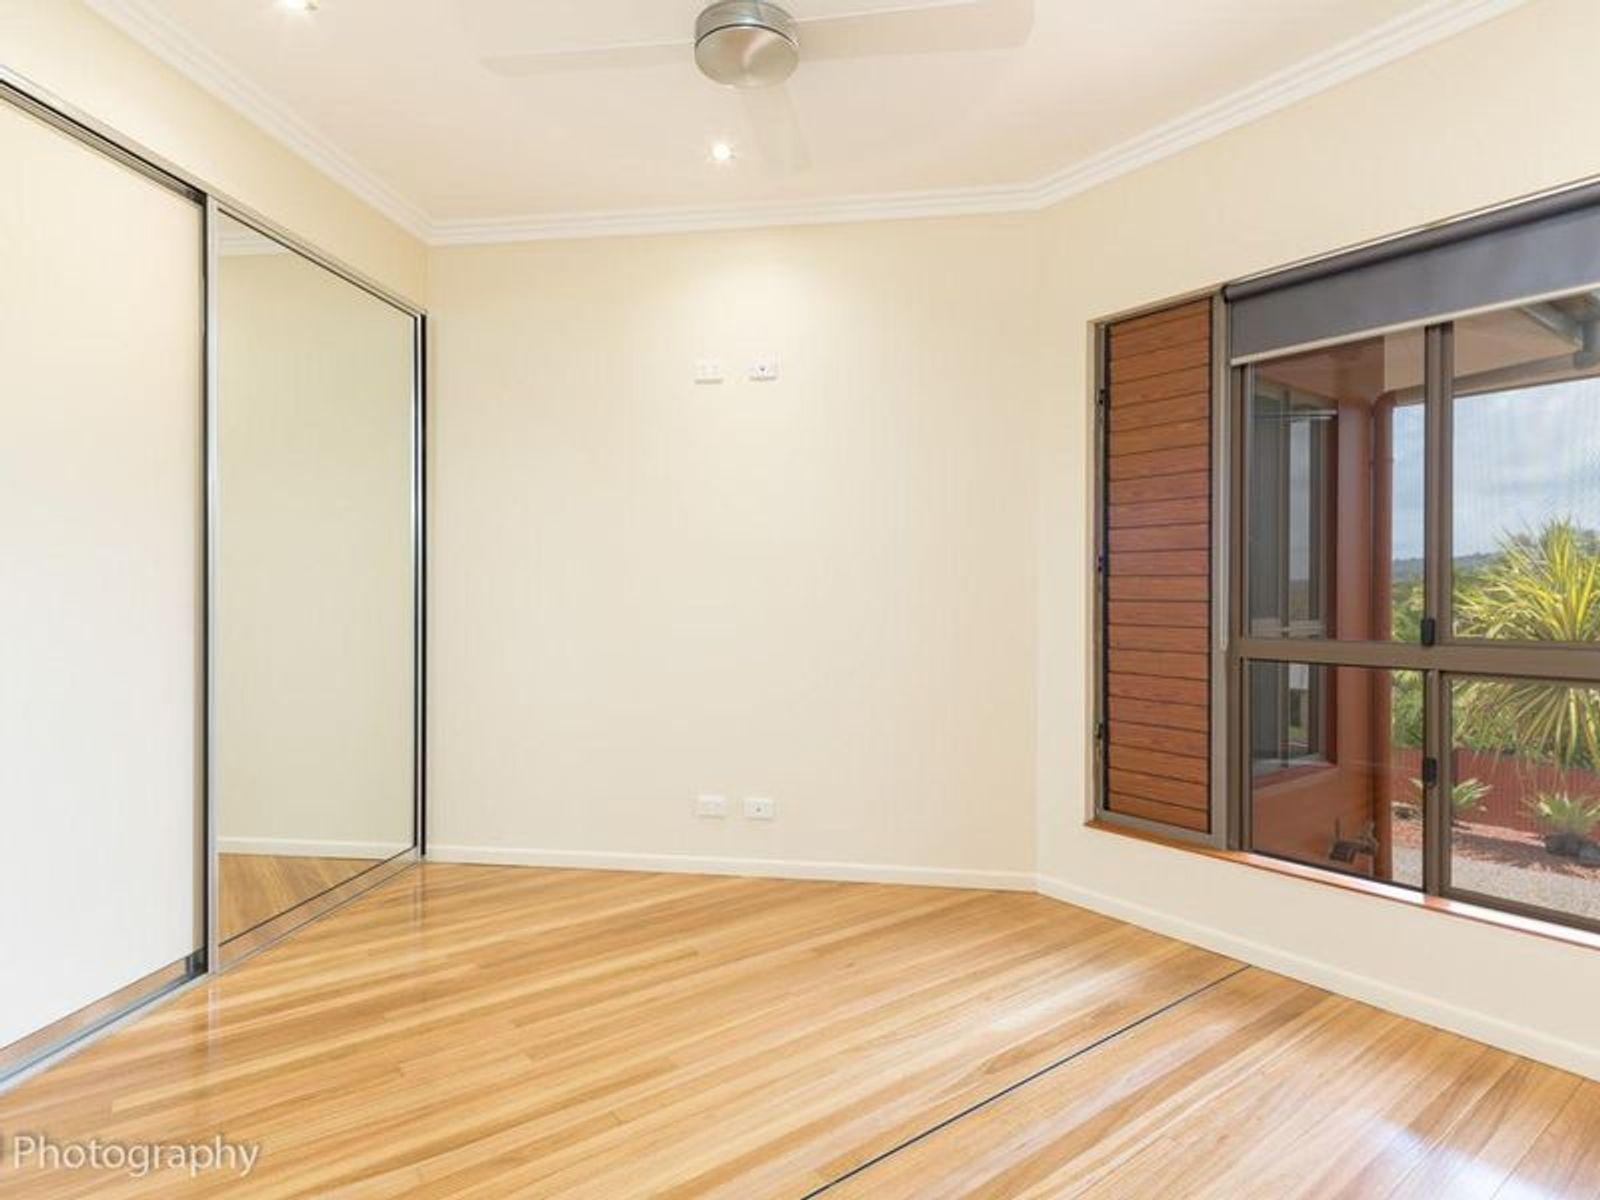 12 Meagher Close, East Innisfail, QLD 4860